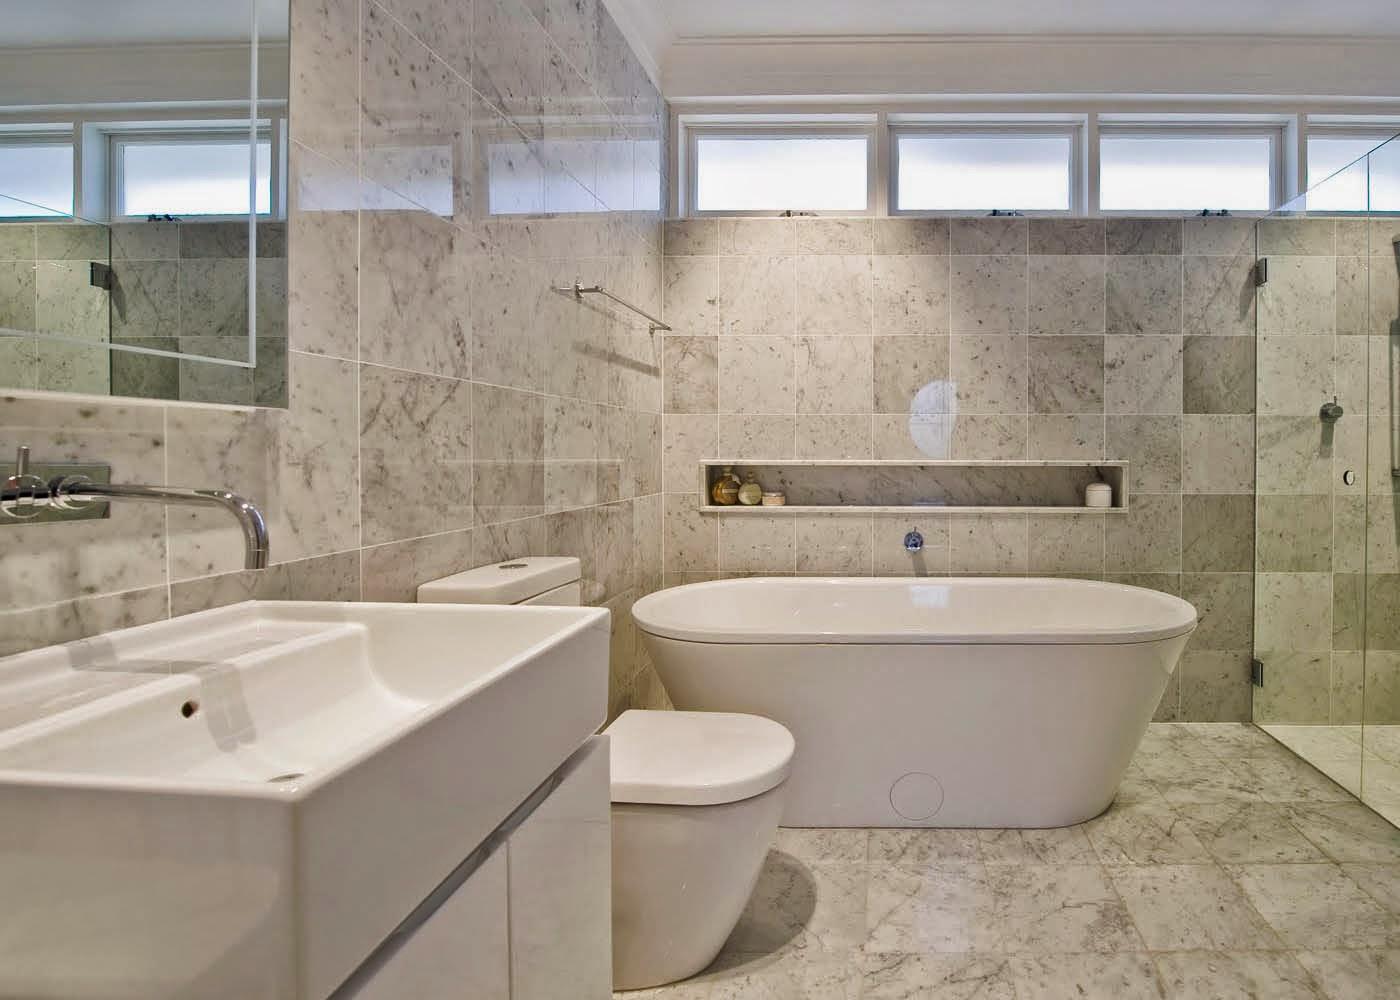 Basic Bathroom Decorating Ideas | Bathroom Ideas